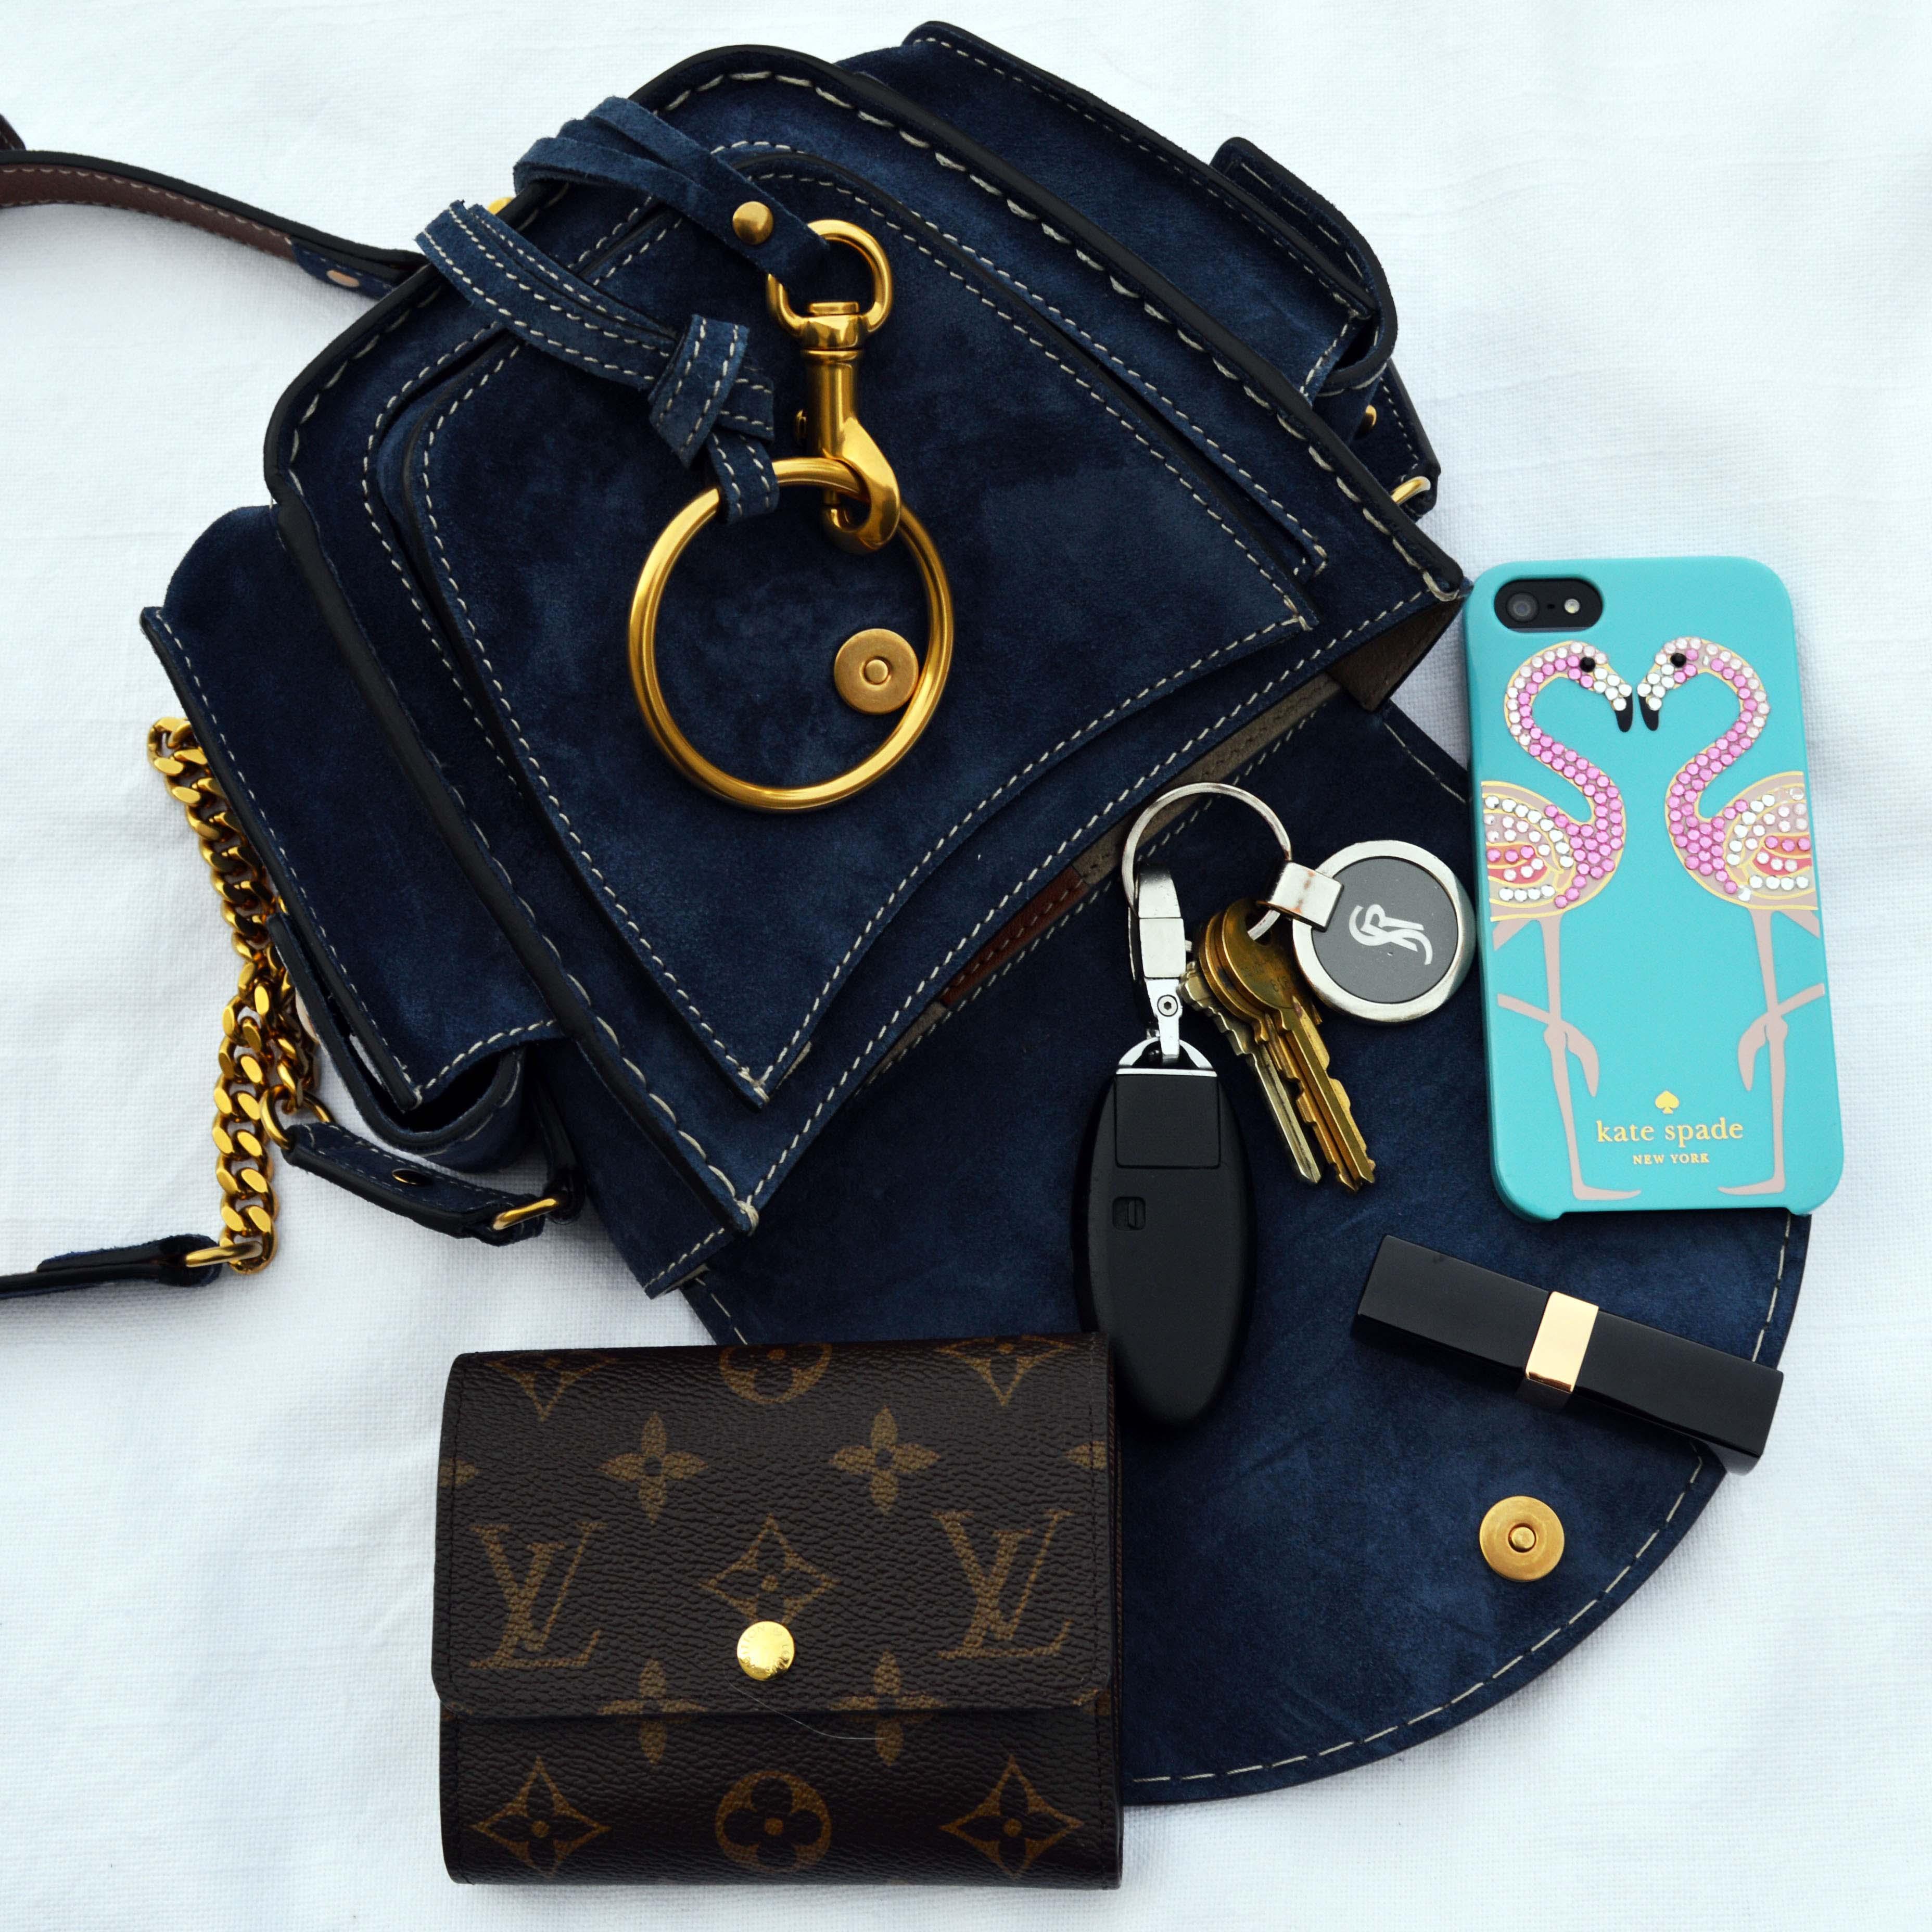 chloe wallets and purses - chloe small jodie leather suede camera bag, fake chloe handbag